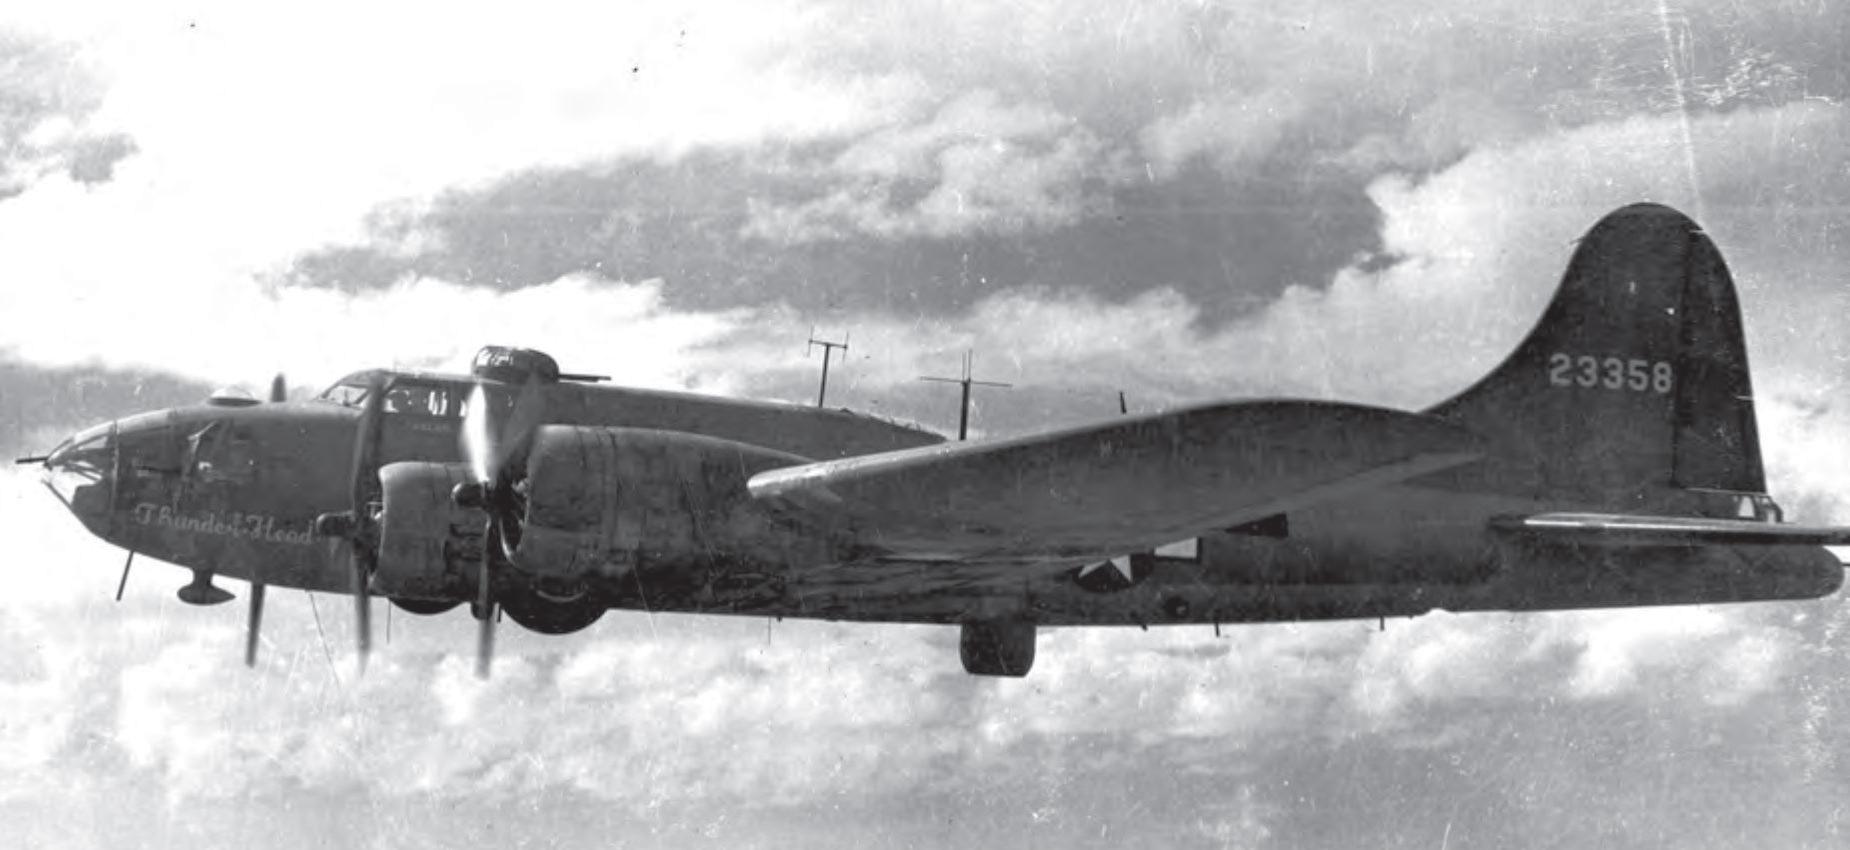 B-17 42-3358